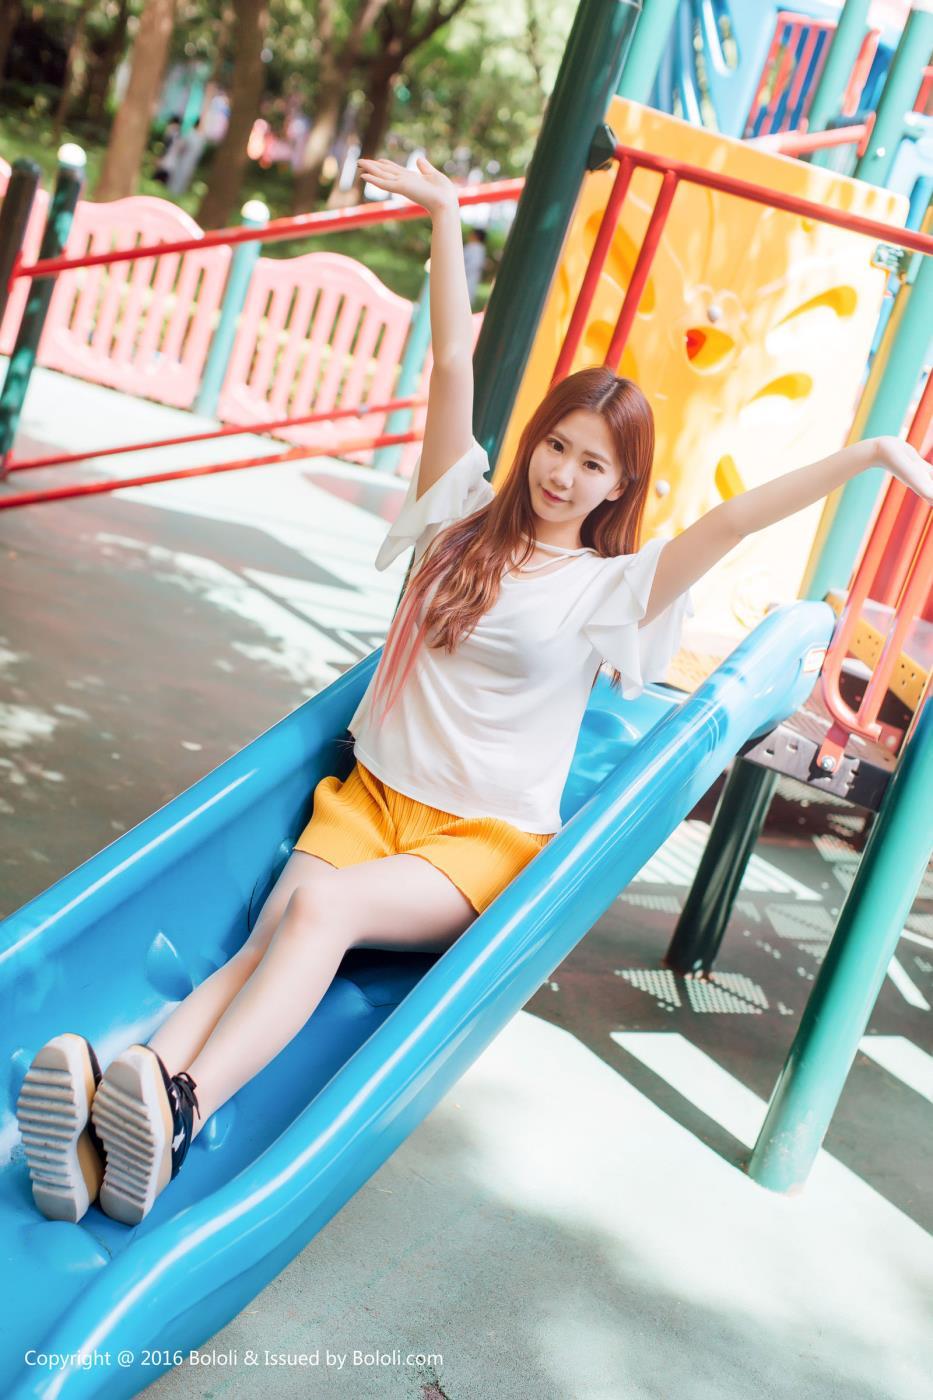 BoLoli波萝社甜美小清新模特董晨莉清纯美女写真图片